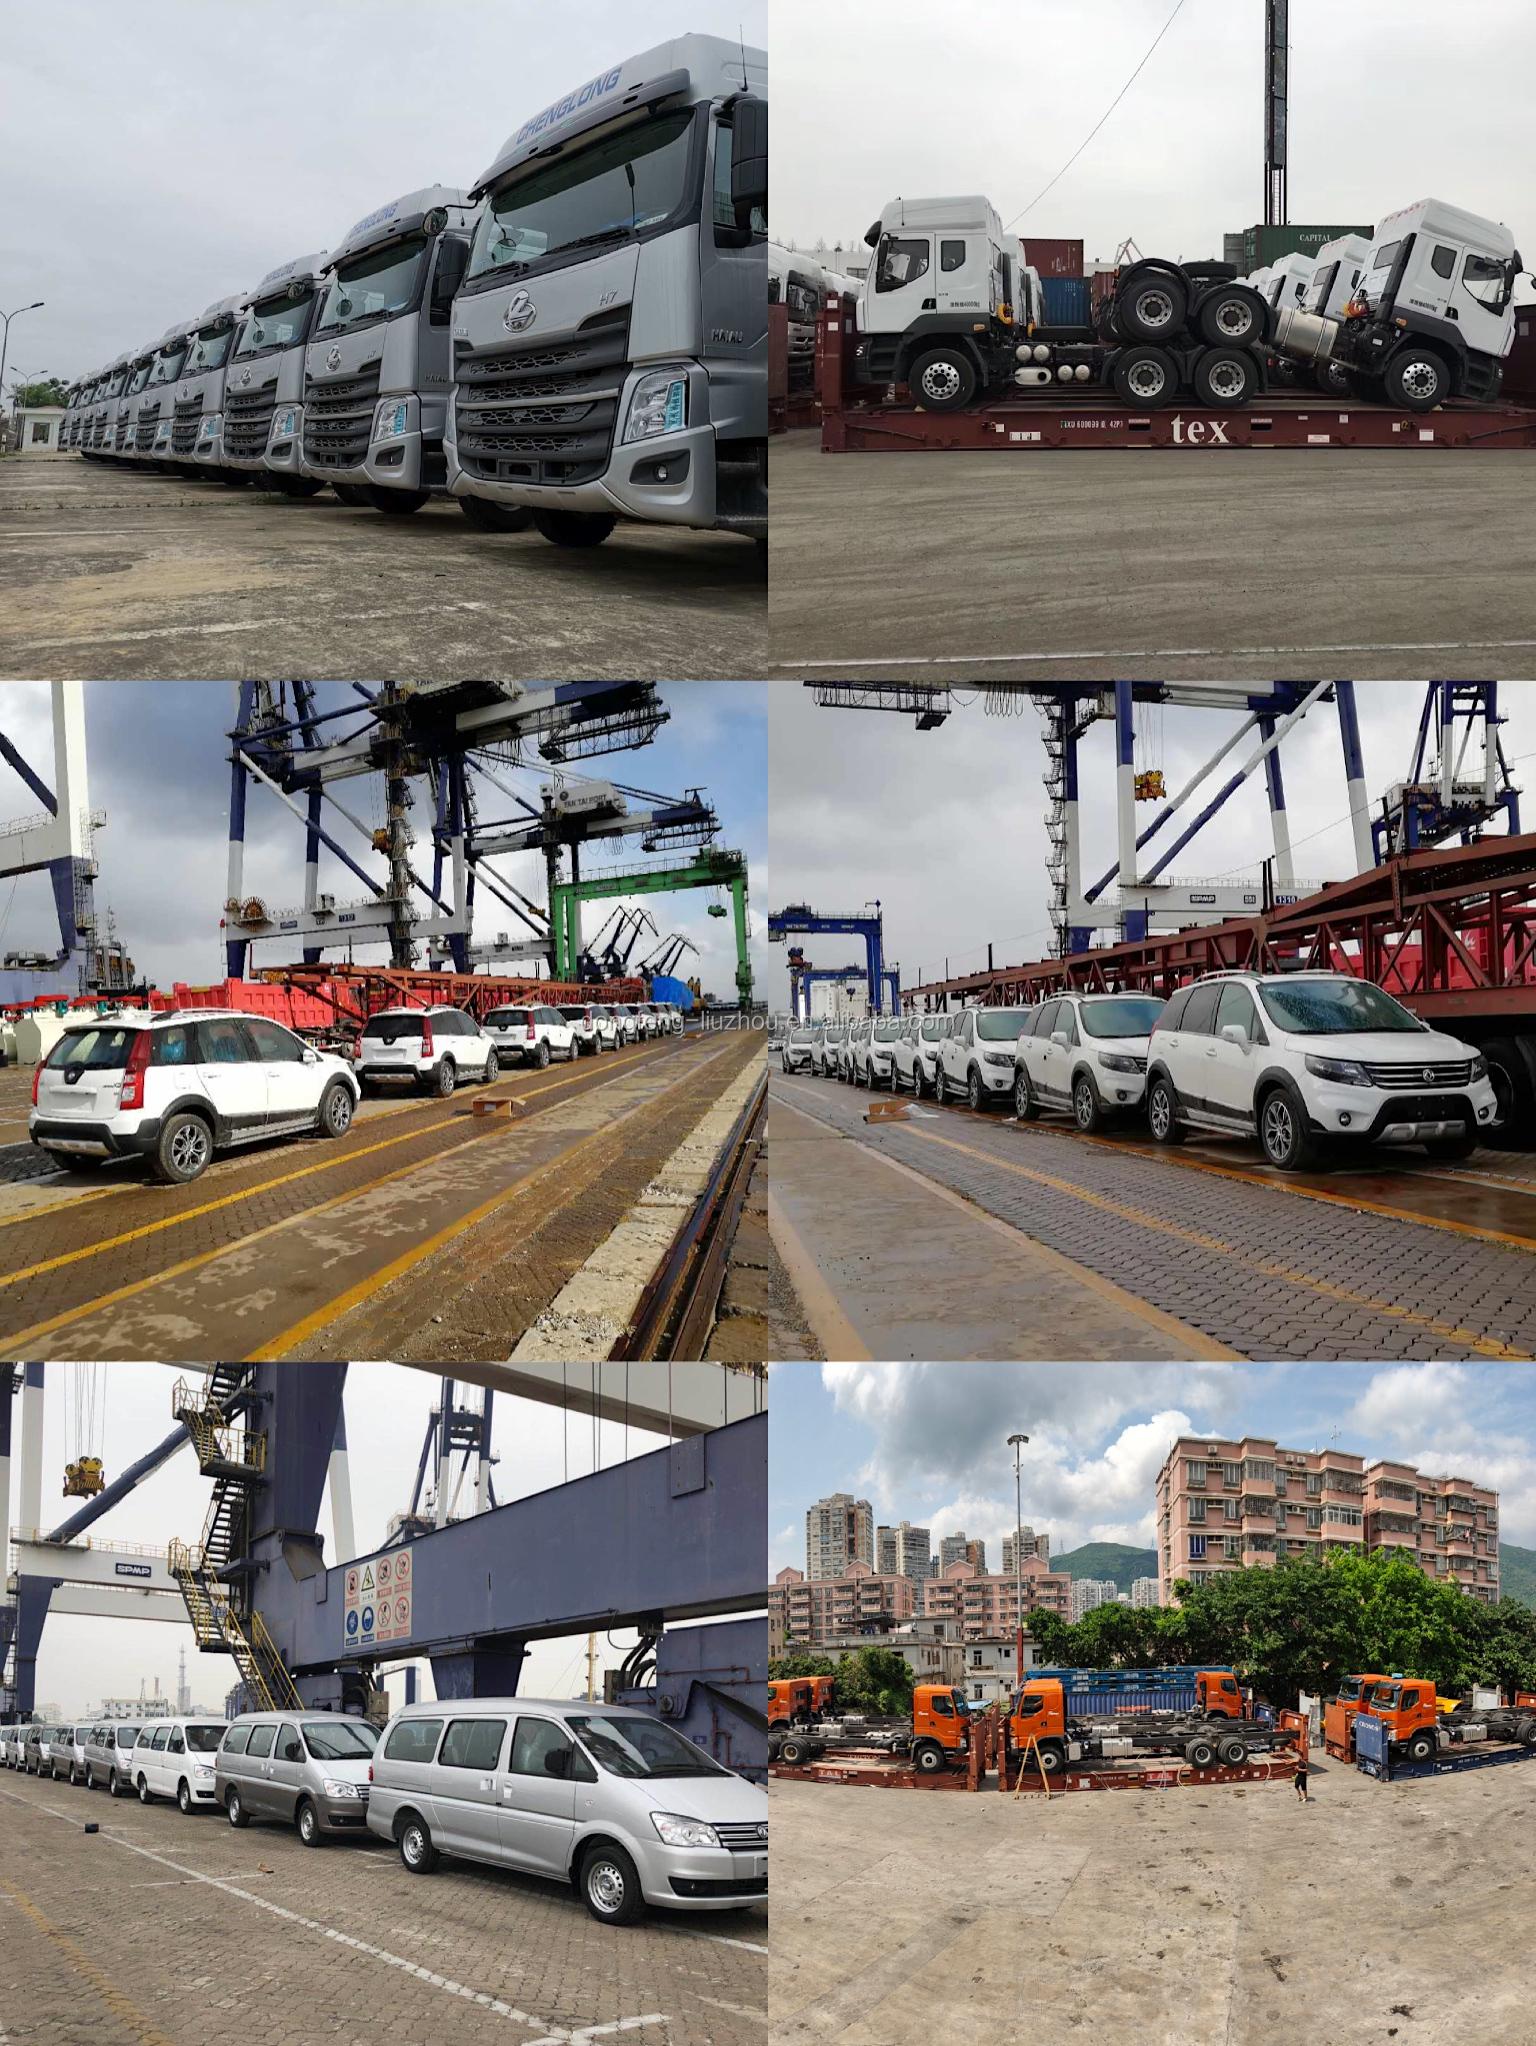 Biggest Street Legal Truck : biggest, street, legal, truck, Dongfeng, Double, Cabin, Pickup, Trucks, Sale,, Trucks,, Product, Details, Liuzhou, Motor, Ltd.., Alibaba.com